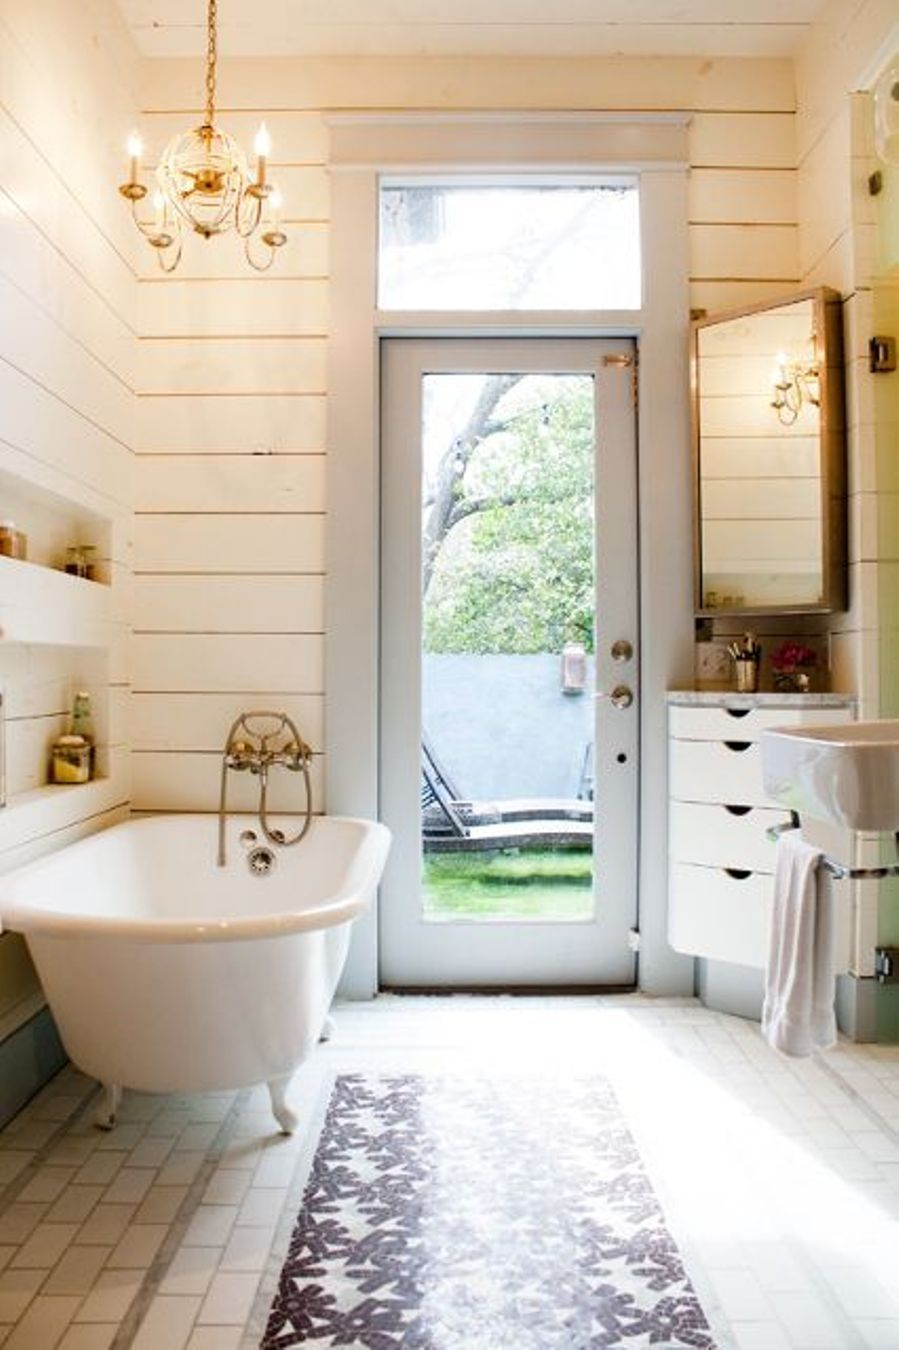 Clawfoot Tub Bathroom Designs Captivating Small Cottage Bathroom Ideas  Home Renovation  Pinterest  Small Decorating Design